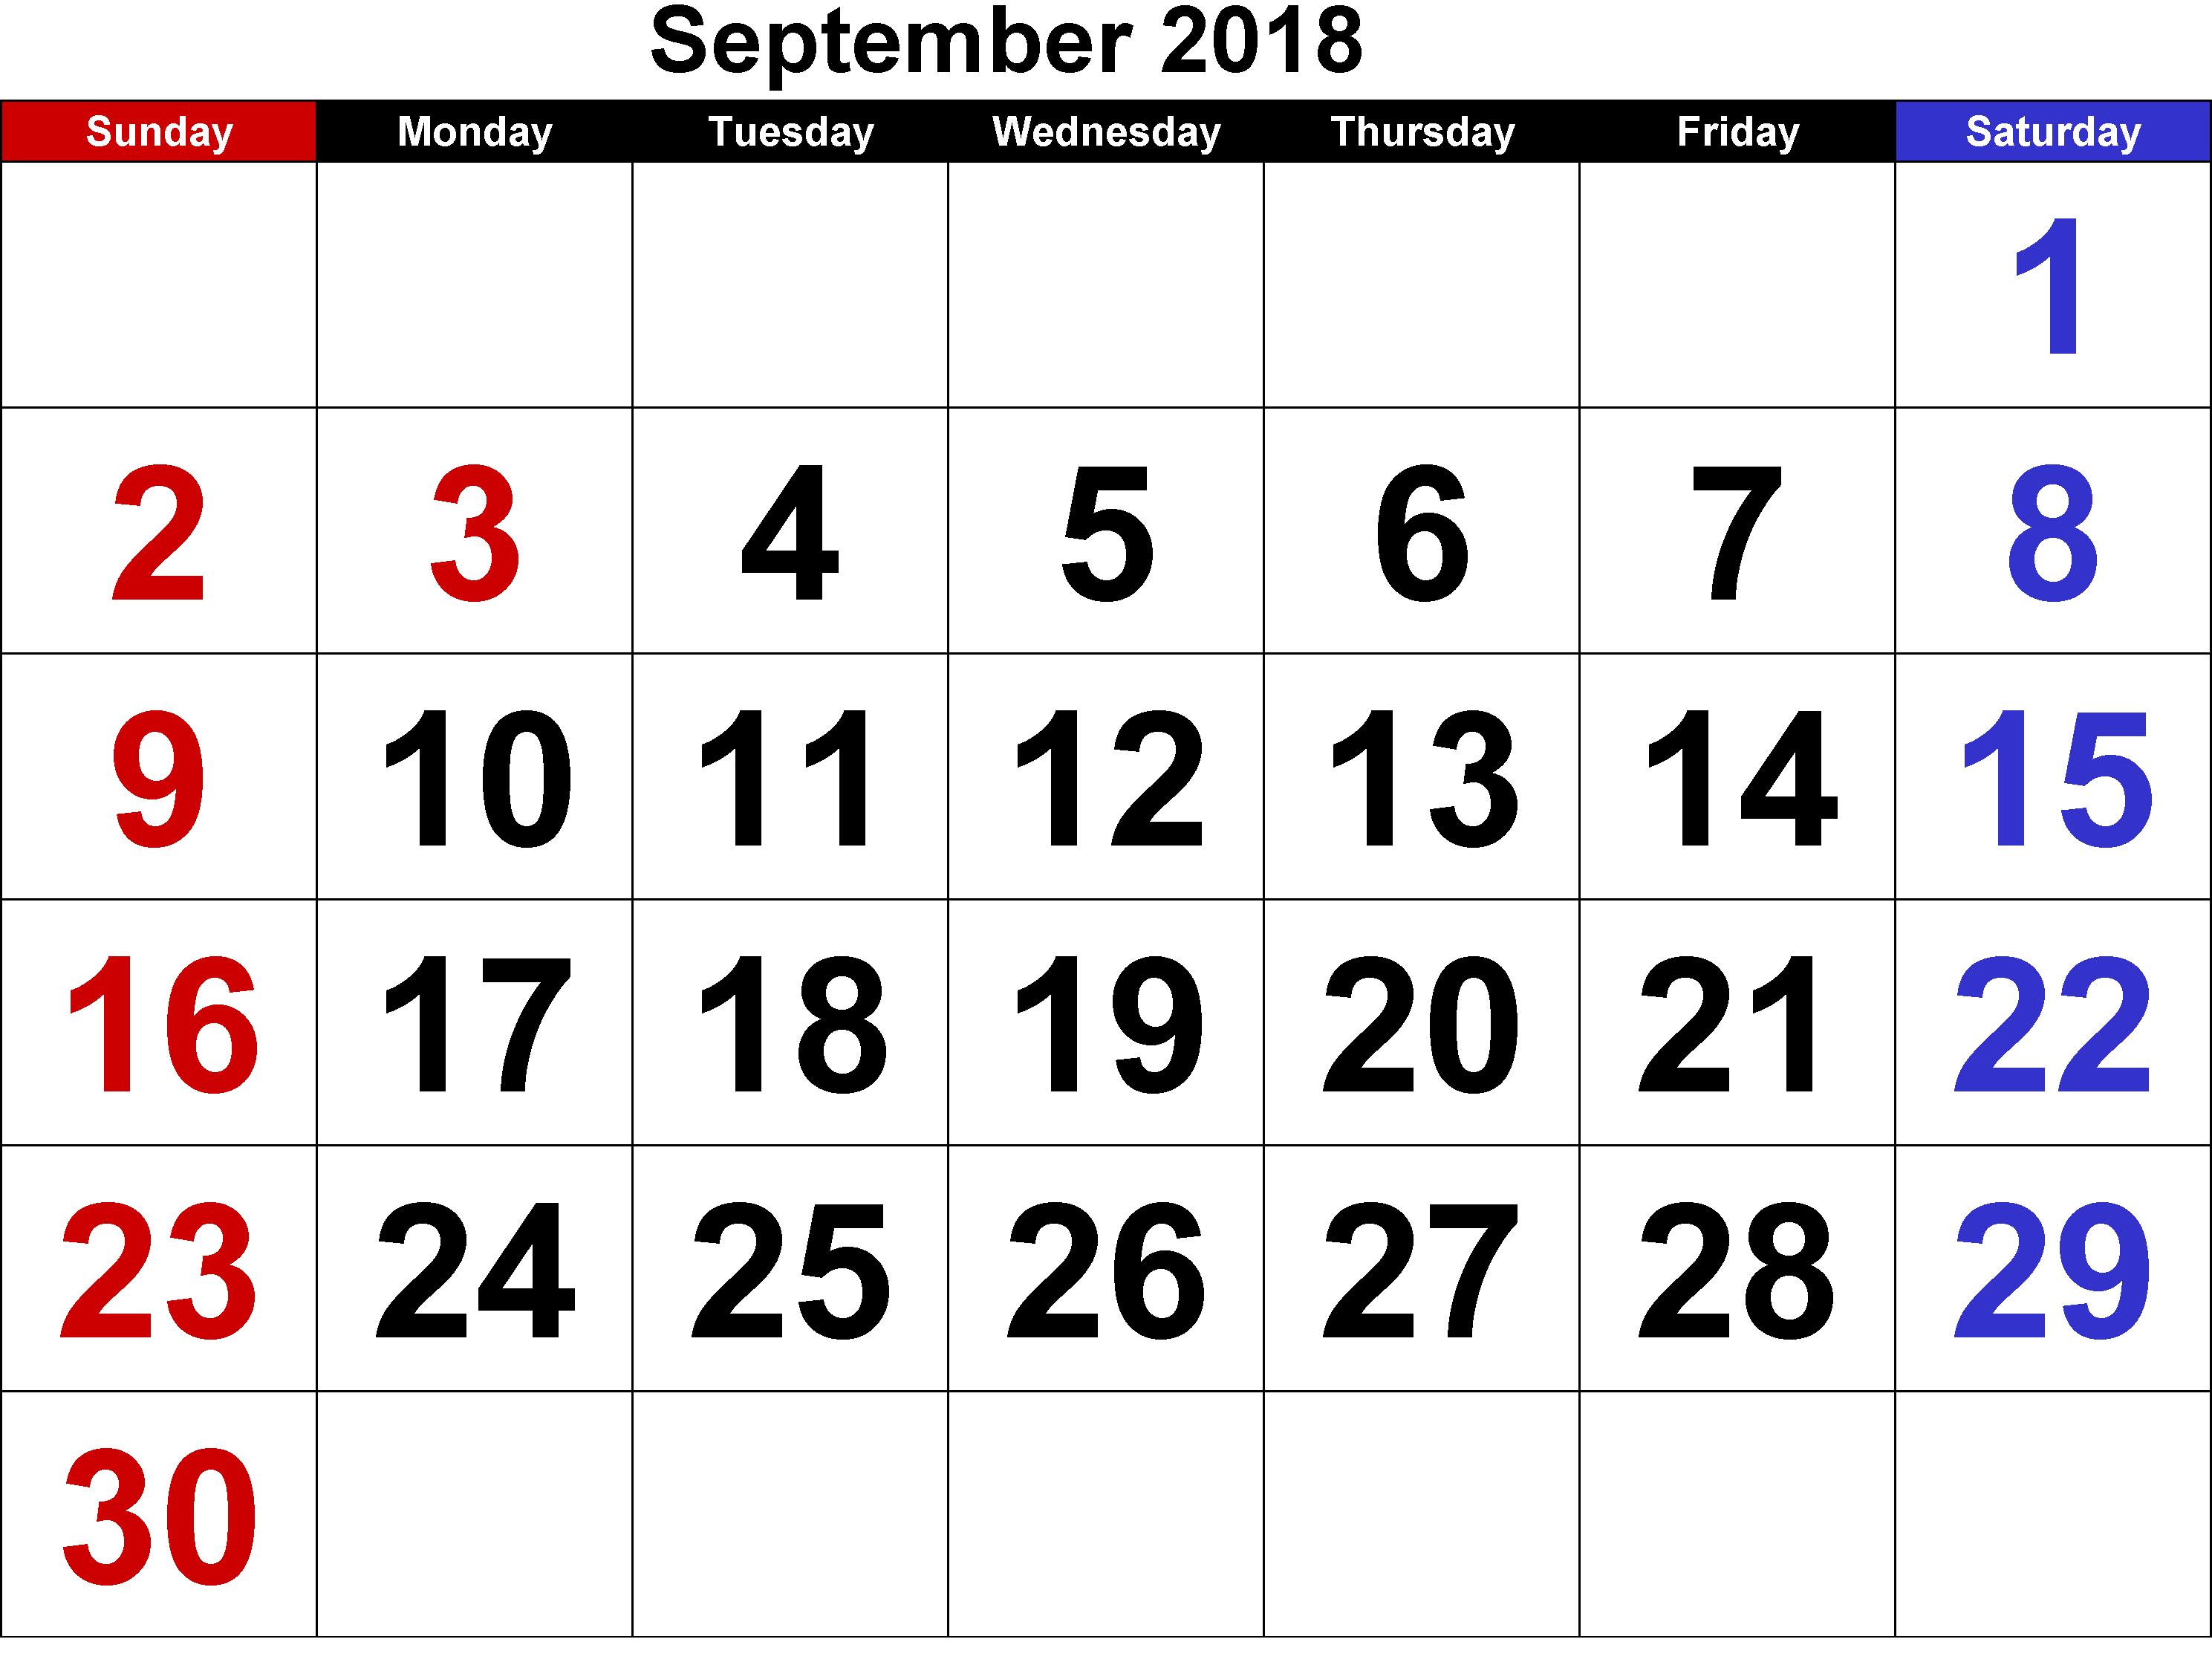 September 2018 Calendar Printable Free